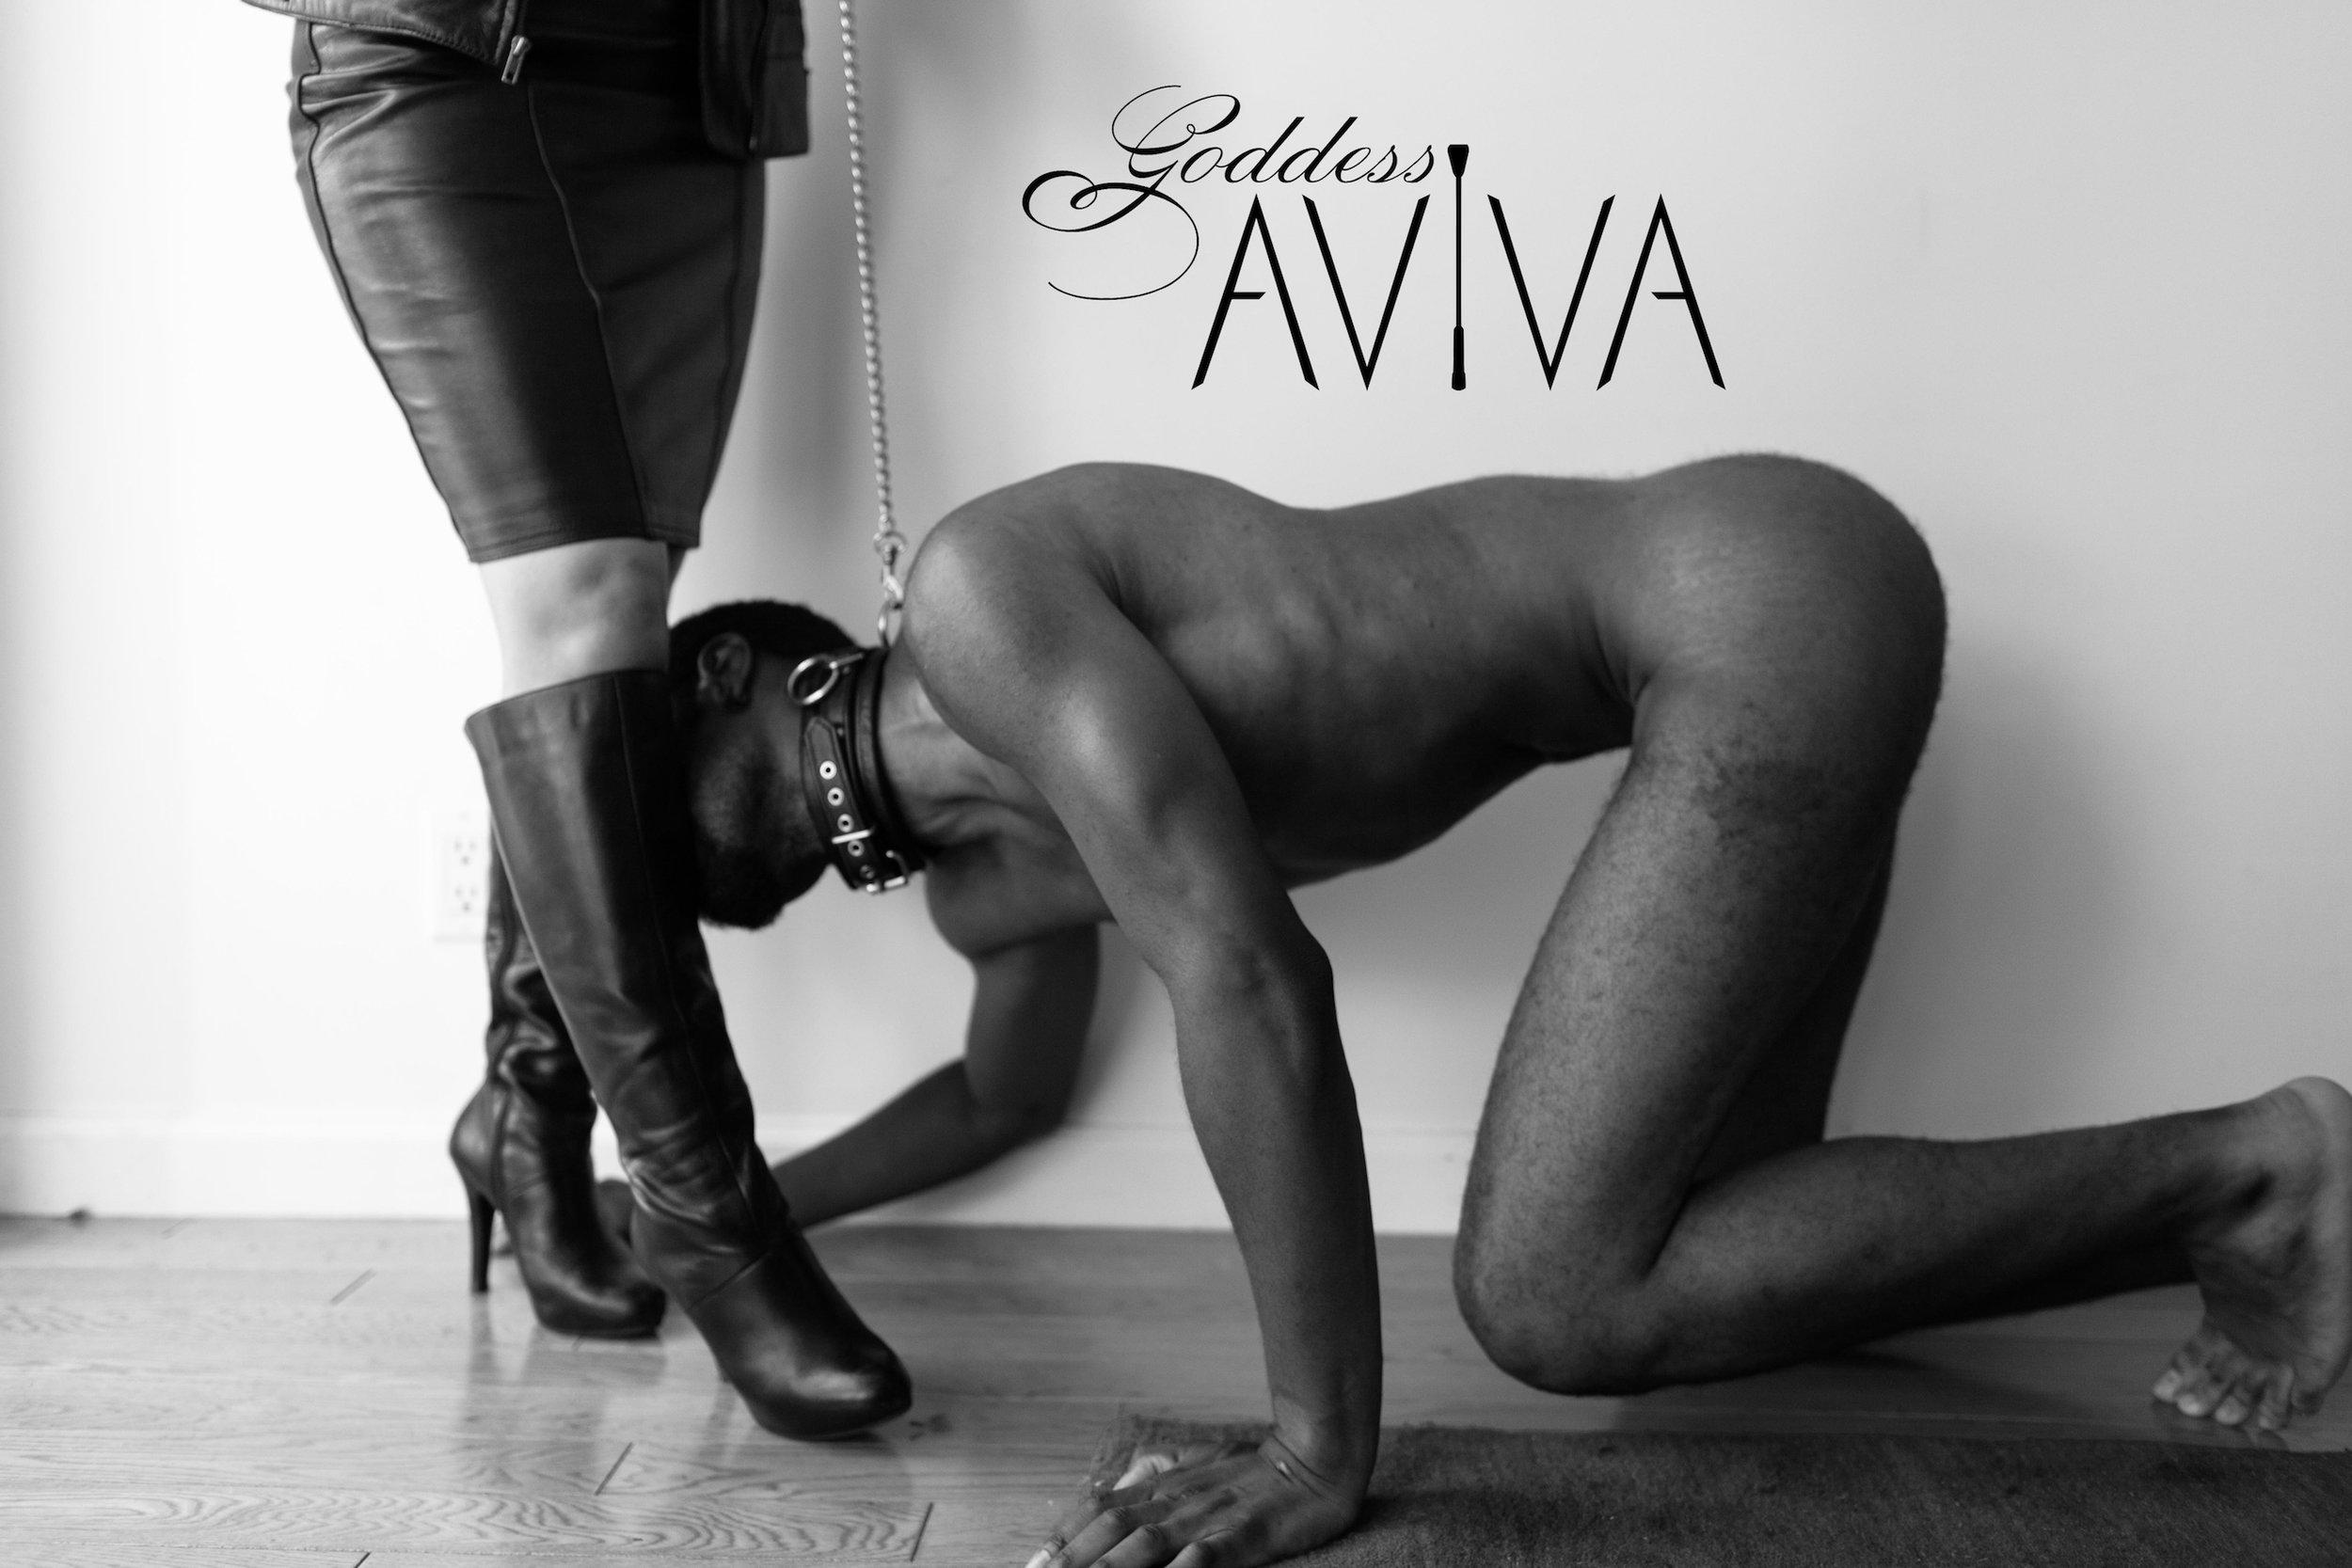 leather_slave.jpg